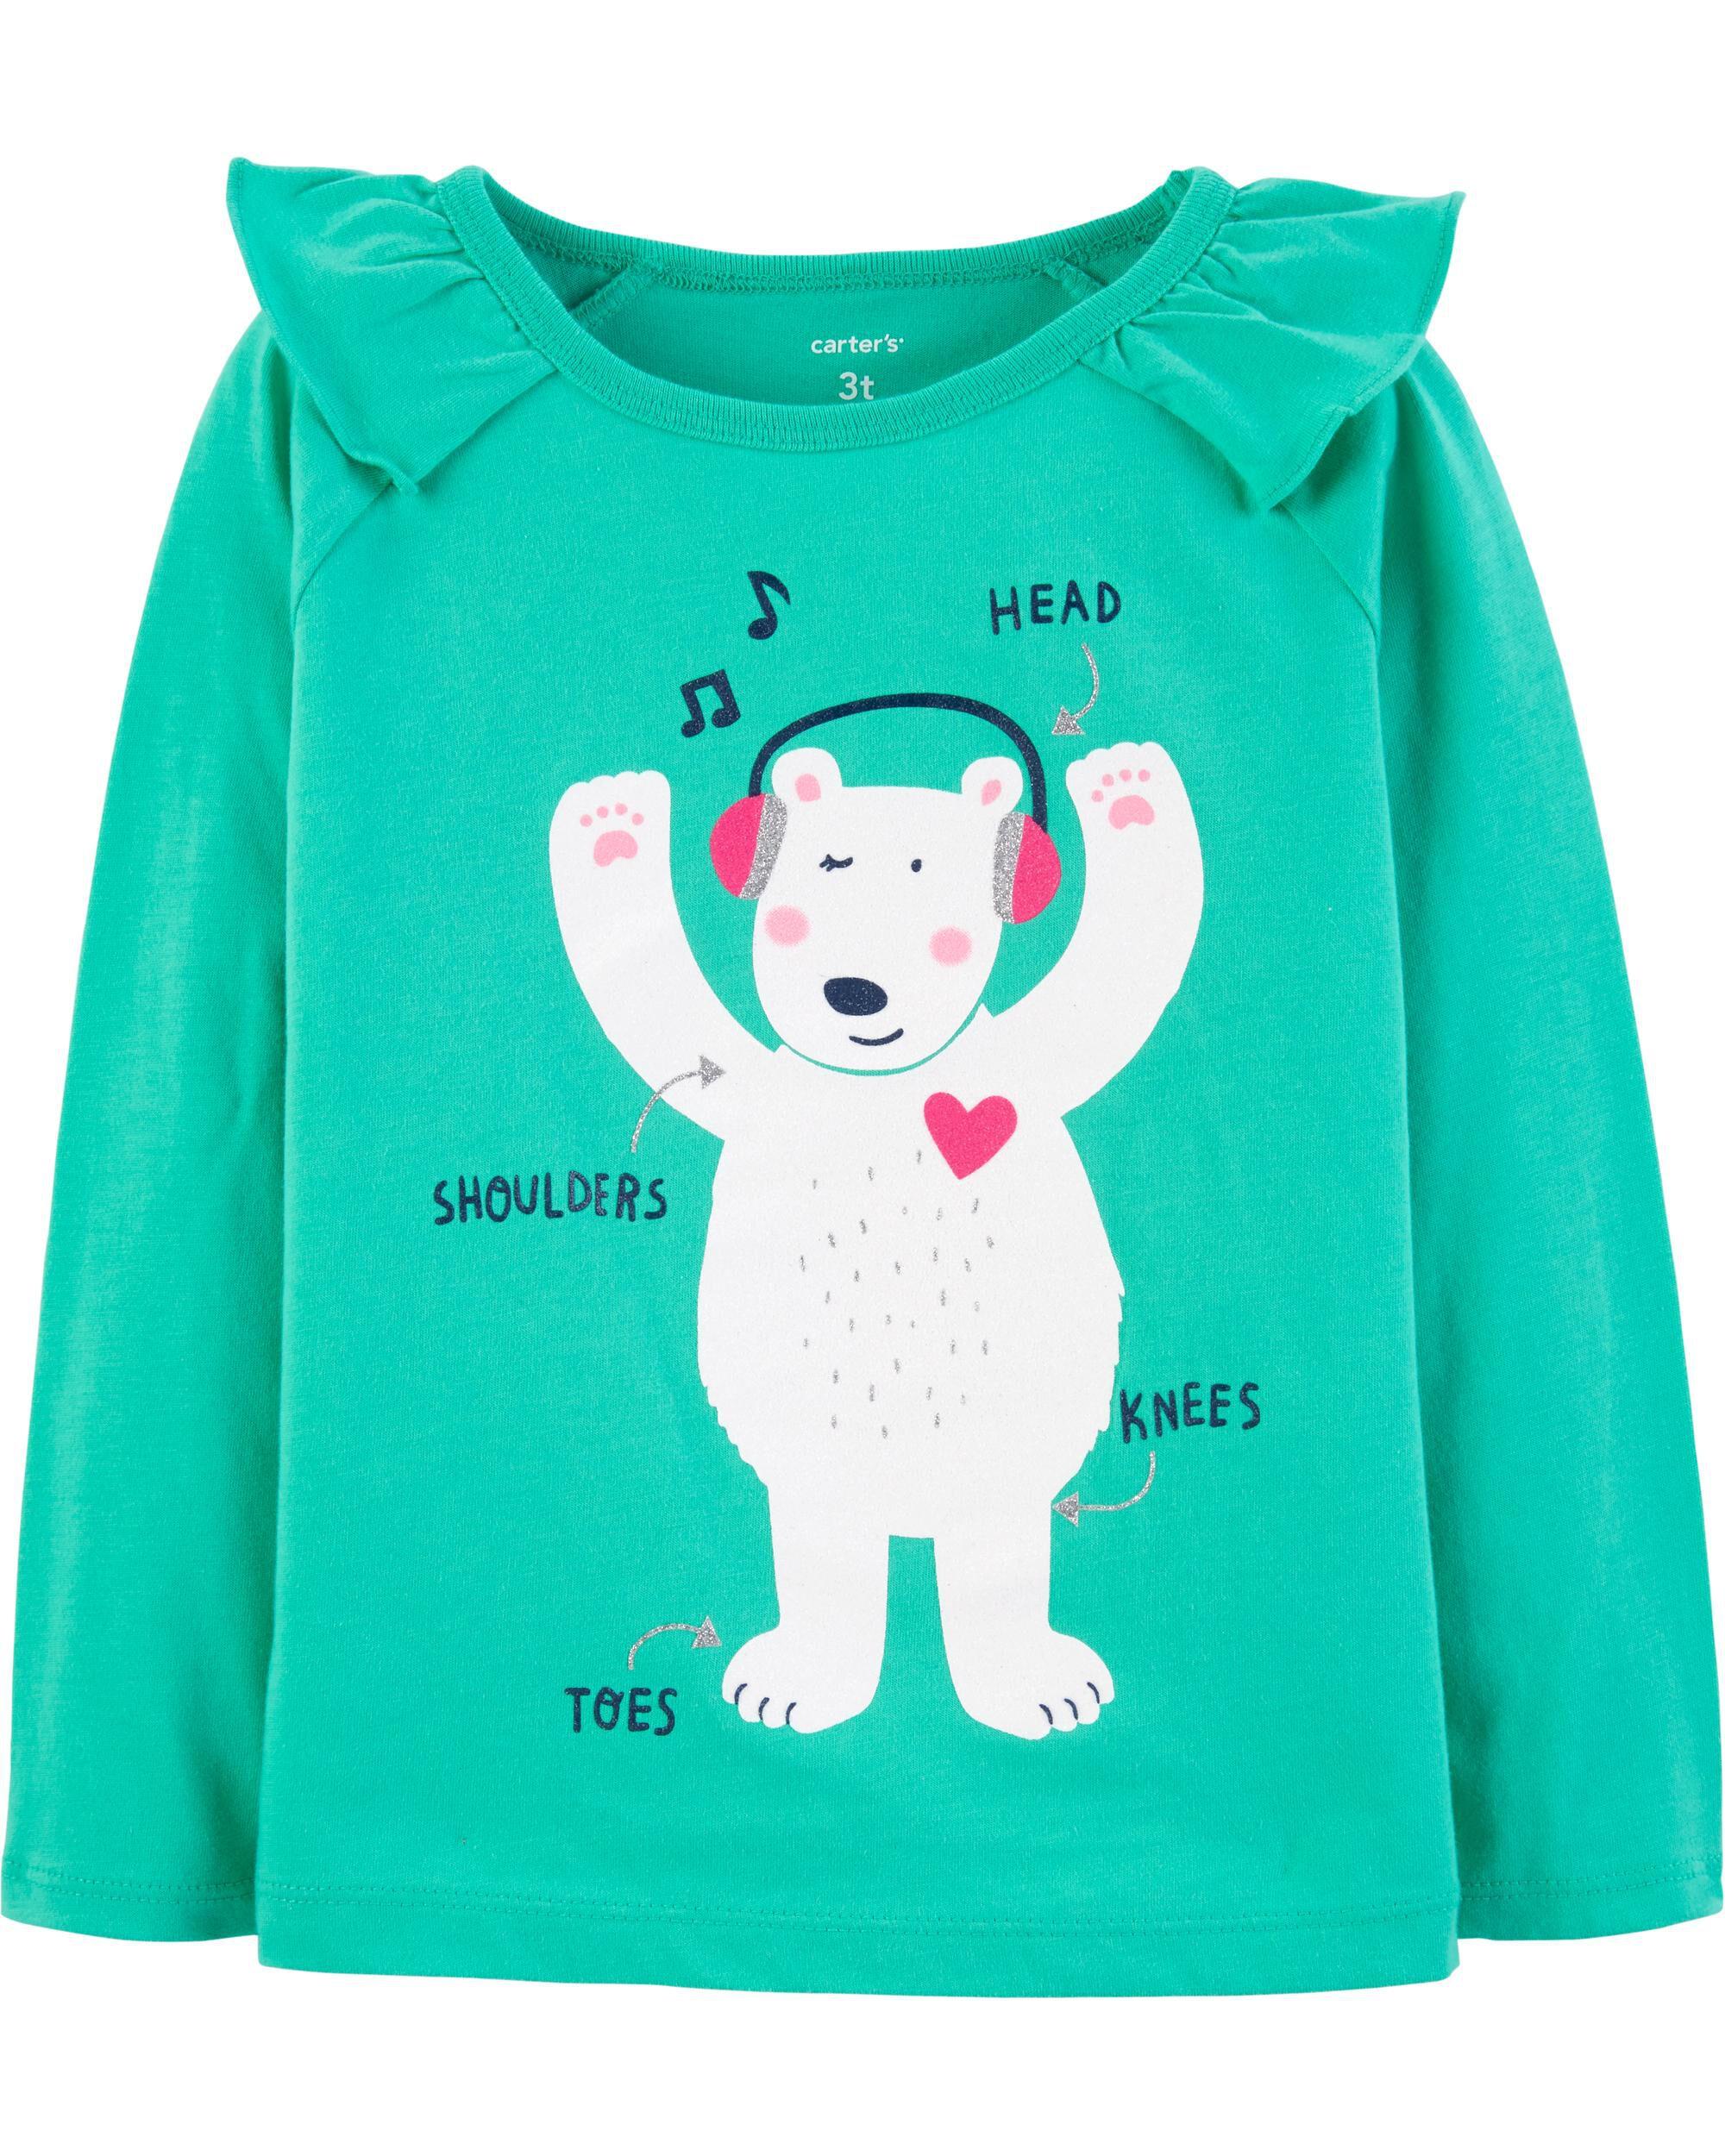 533e92969 Polar Bear Flutter Tee